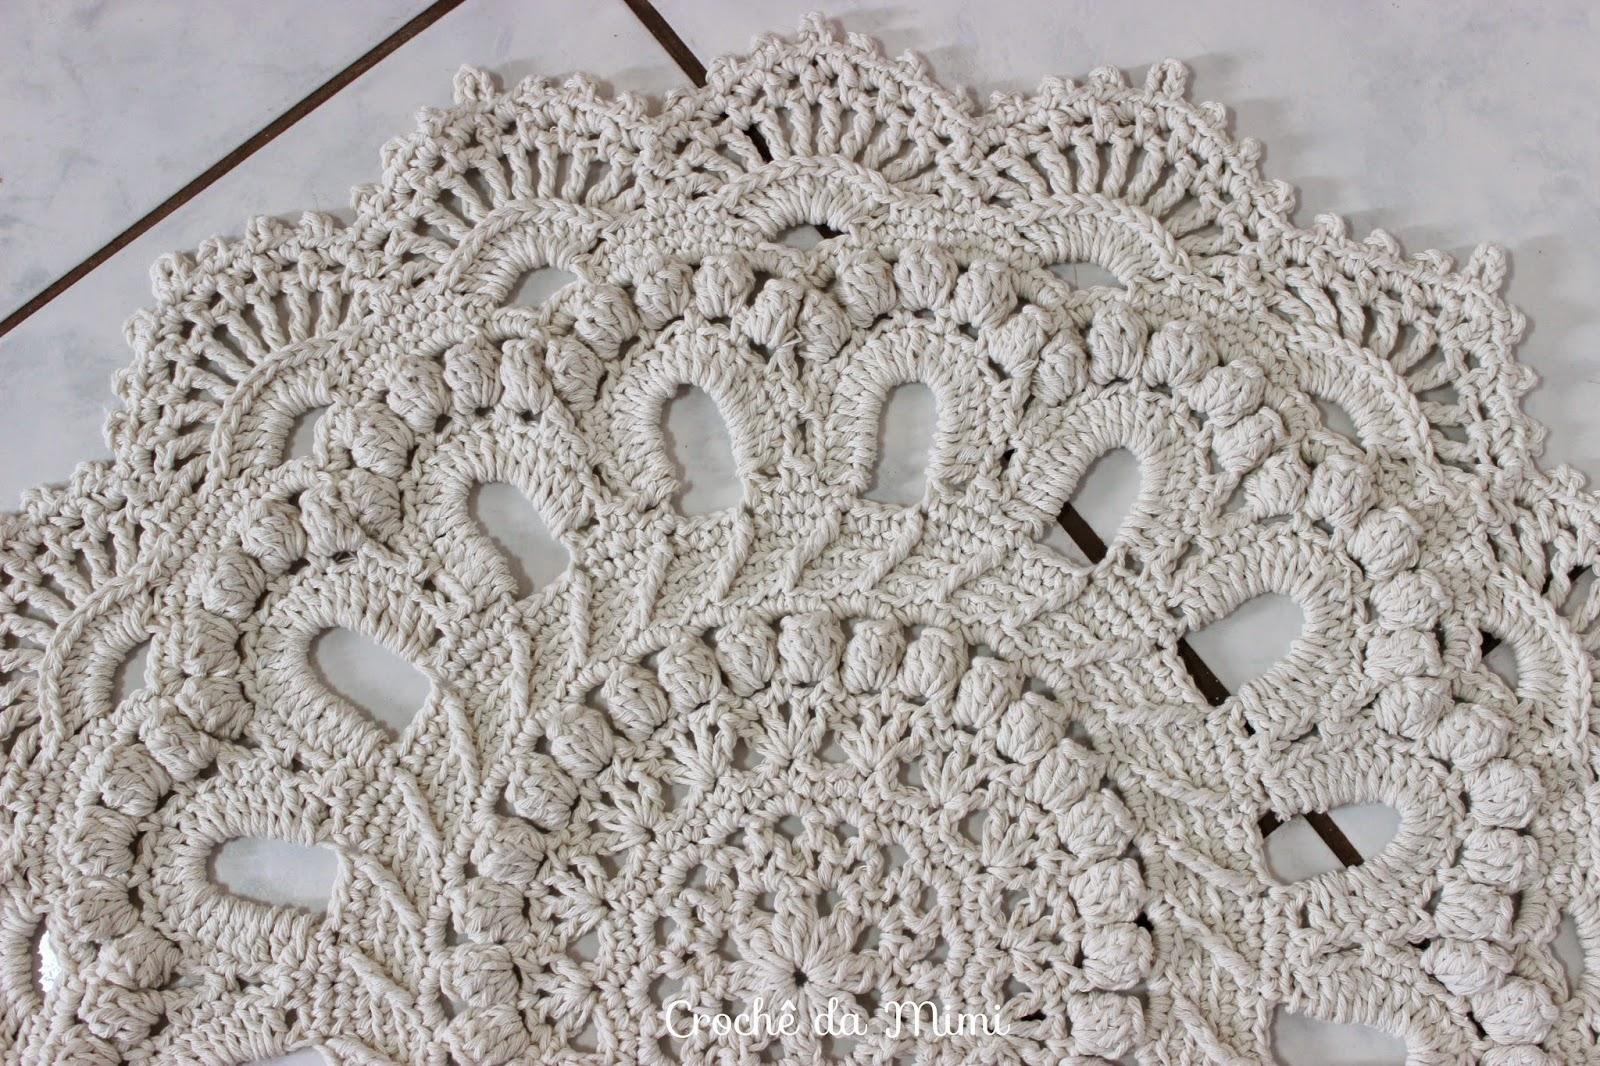 Tapetes De Croche Para Quarto De Menina Nchome Info -> Tapete De Croche Redondo Passo A Passo